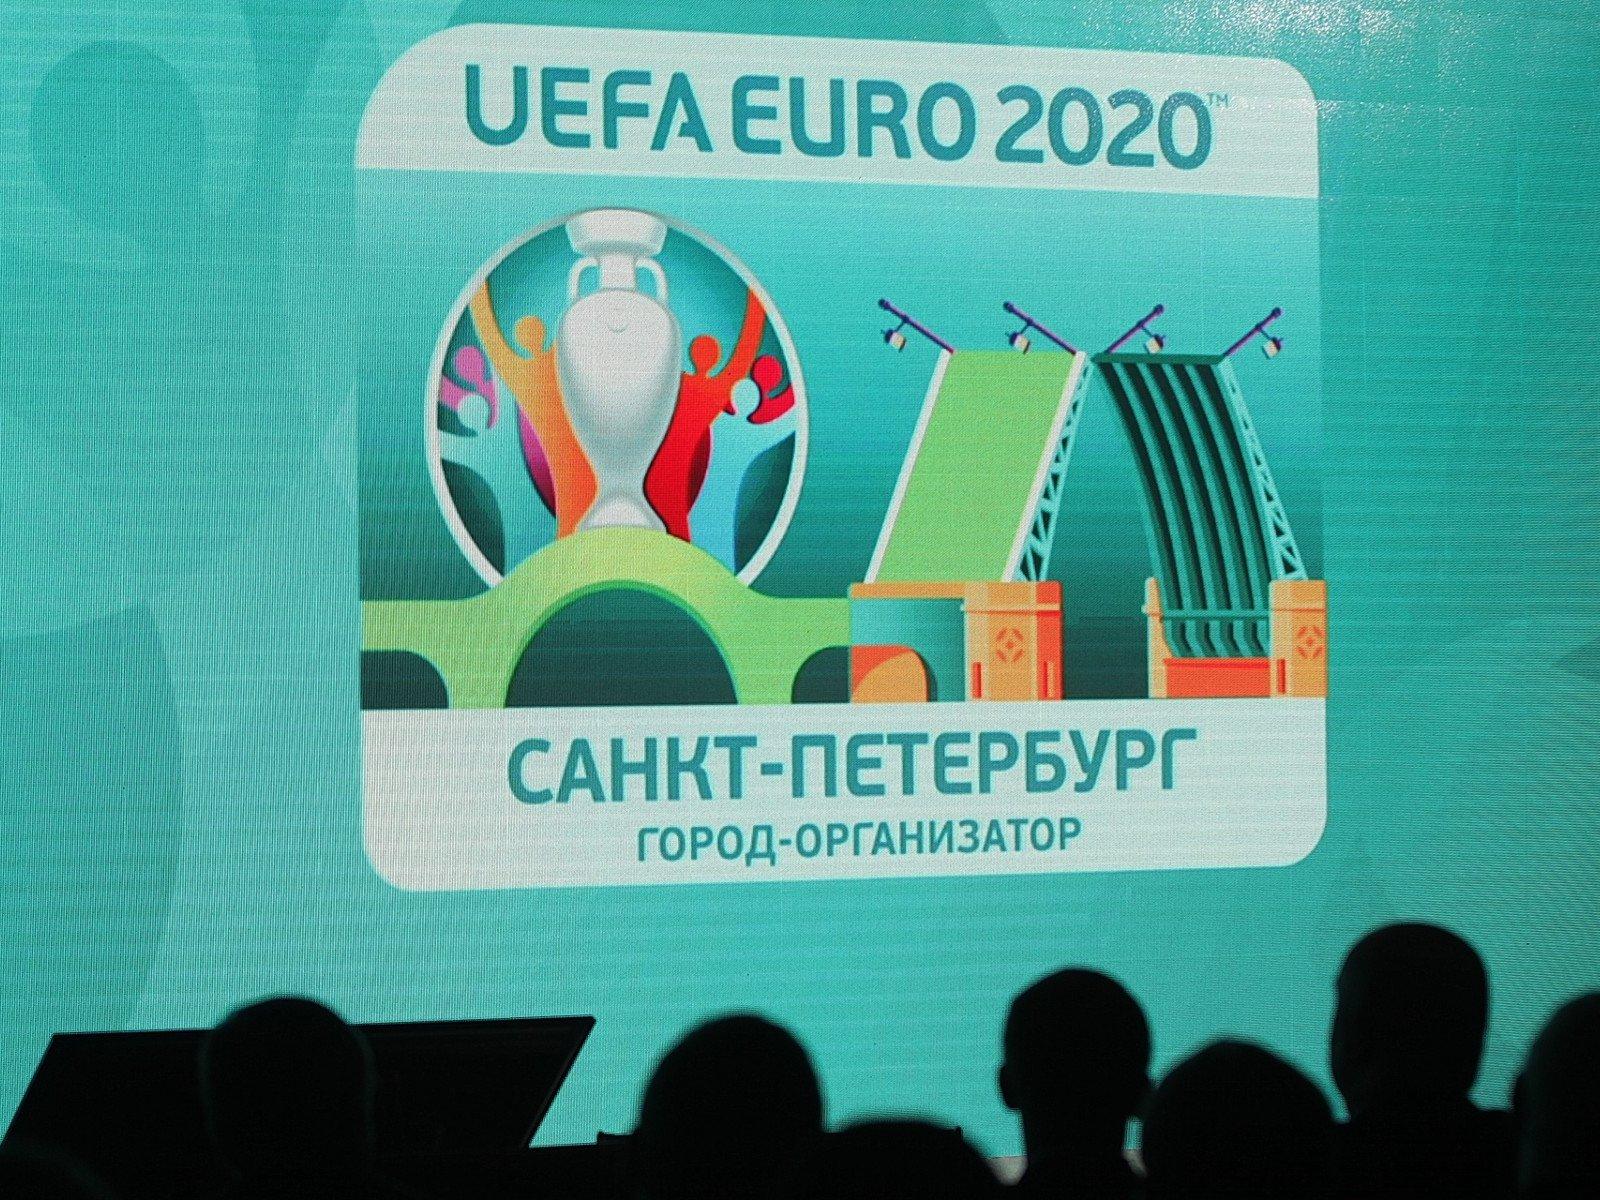 ВПетербурге презентовали знак петербургского этапа Евро